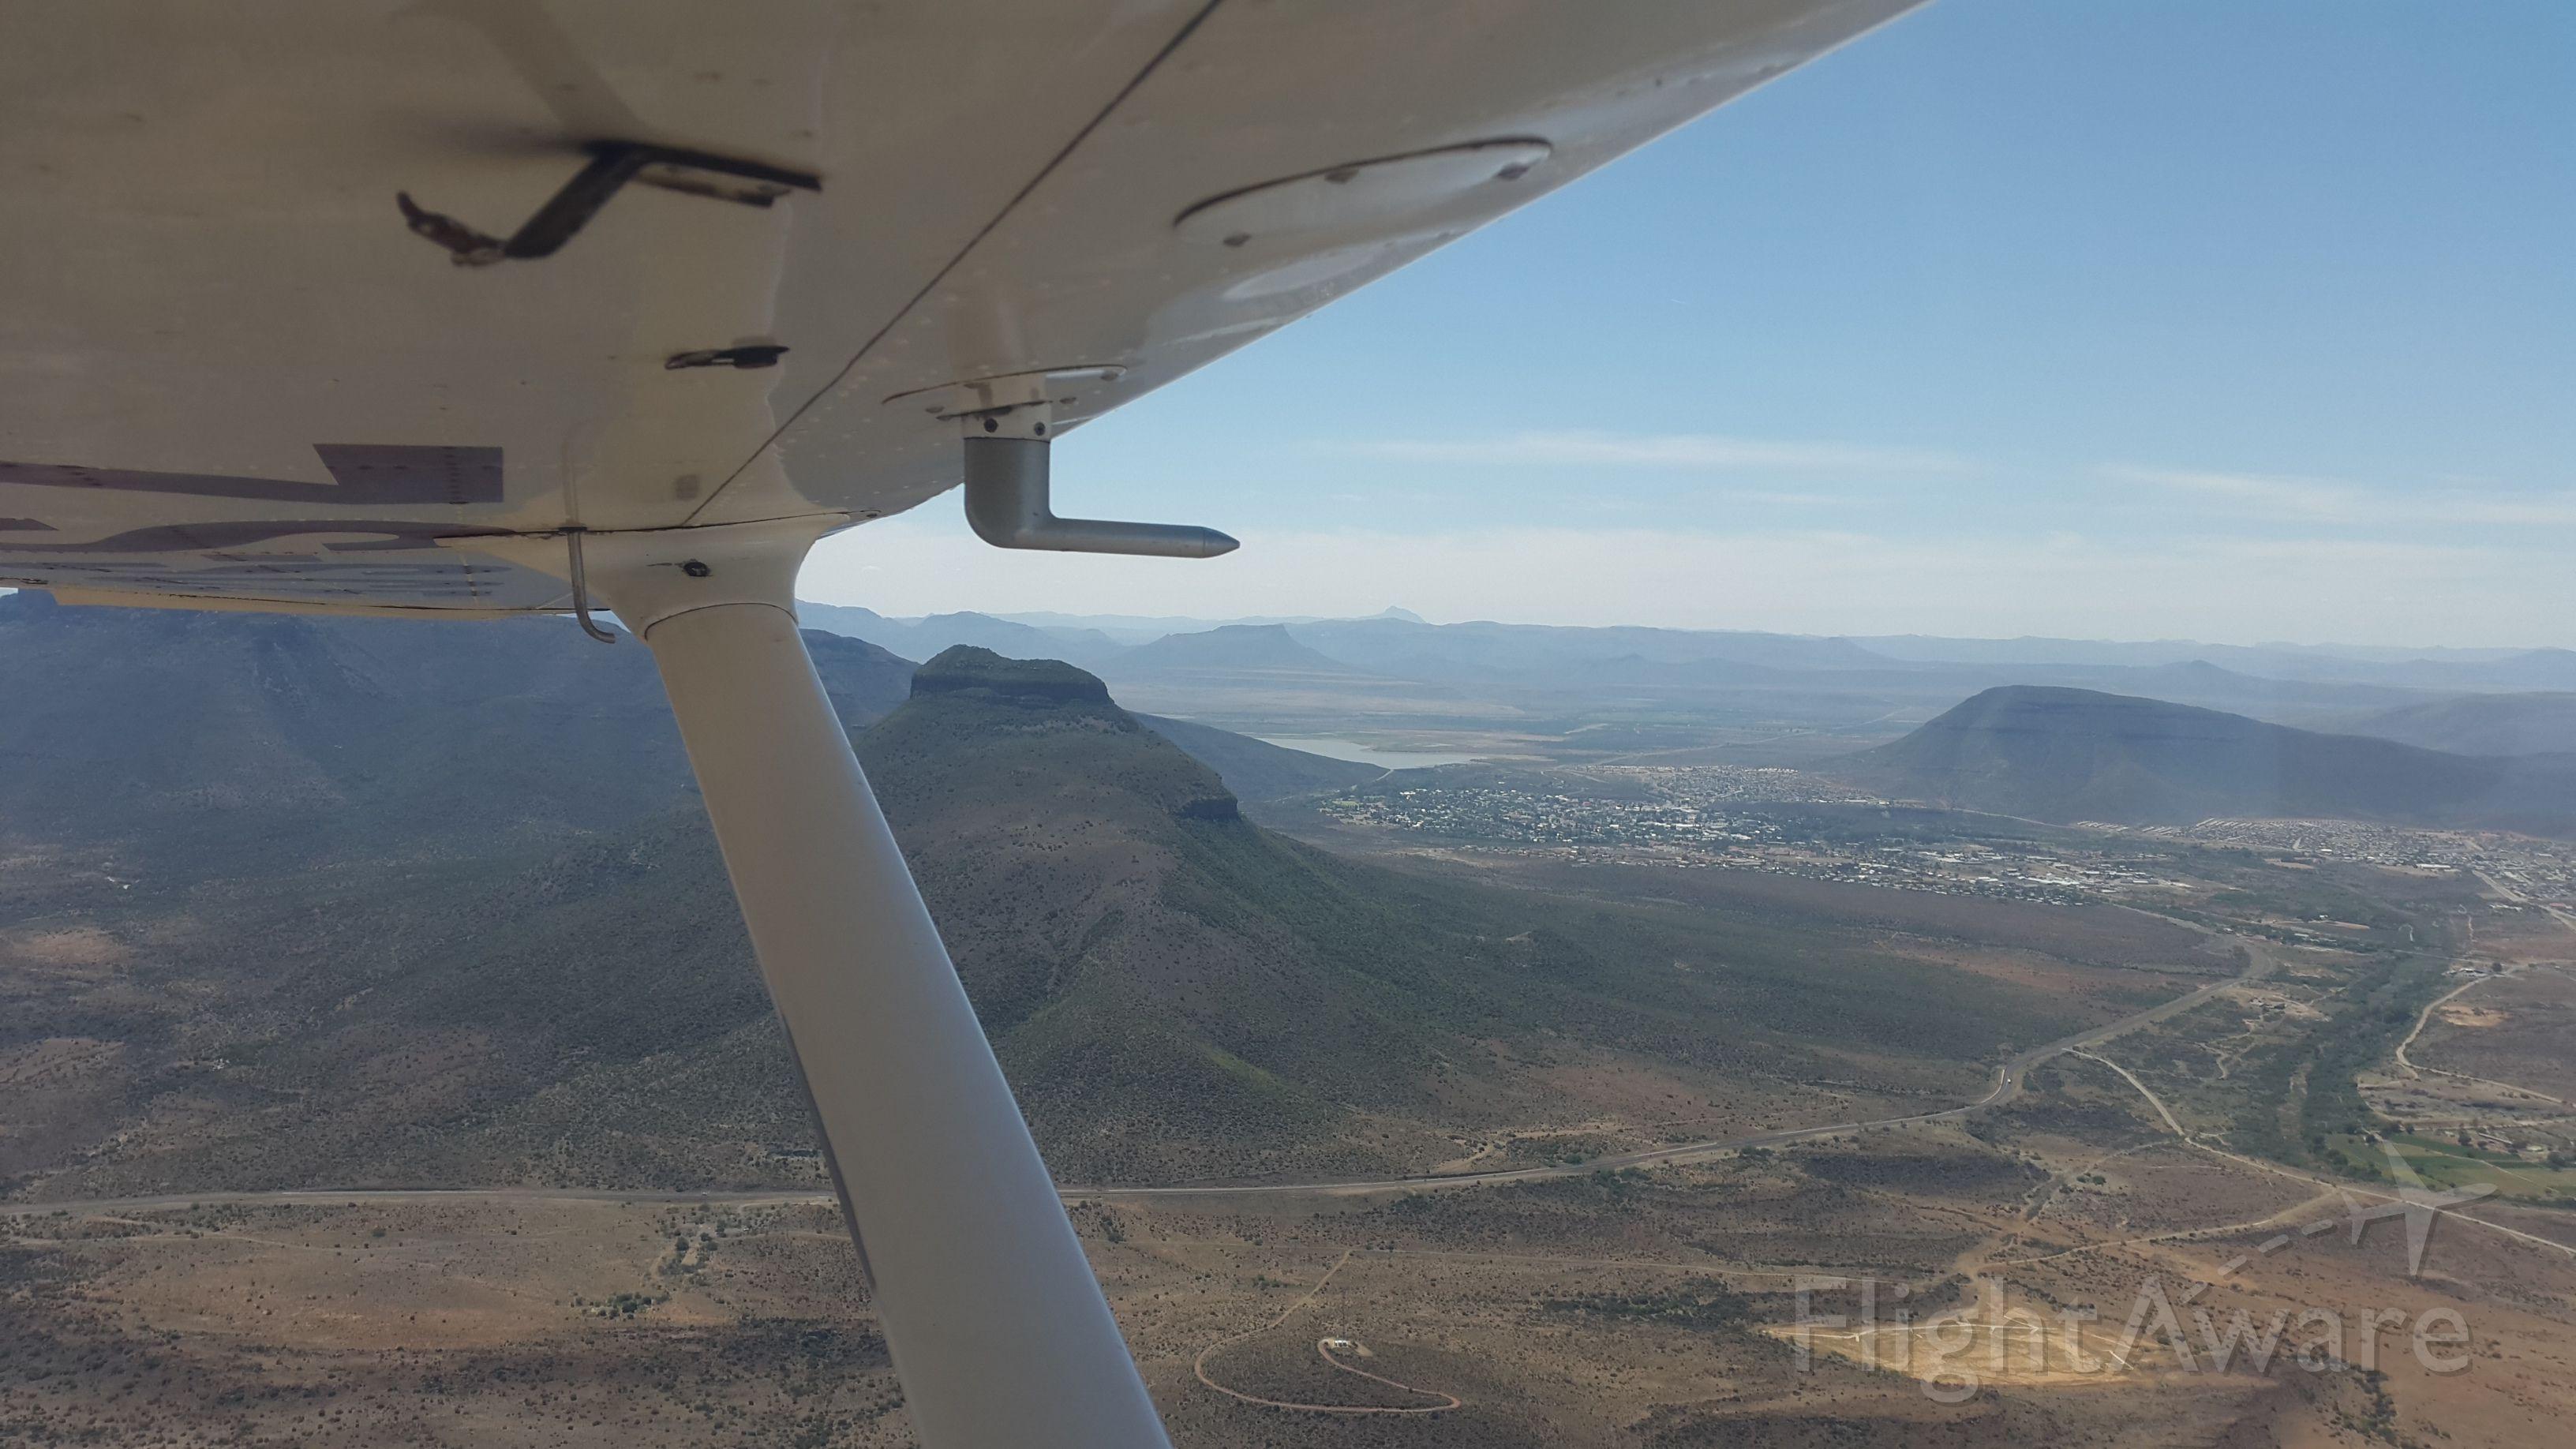 Cessna Skyhawk (ZS-SCE) - On approach to Graaff-Reinet airfield FARG after a flight from Cape Town to the Karoo desert